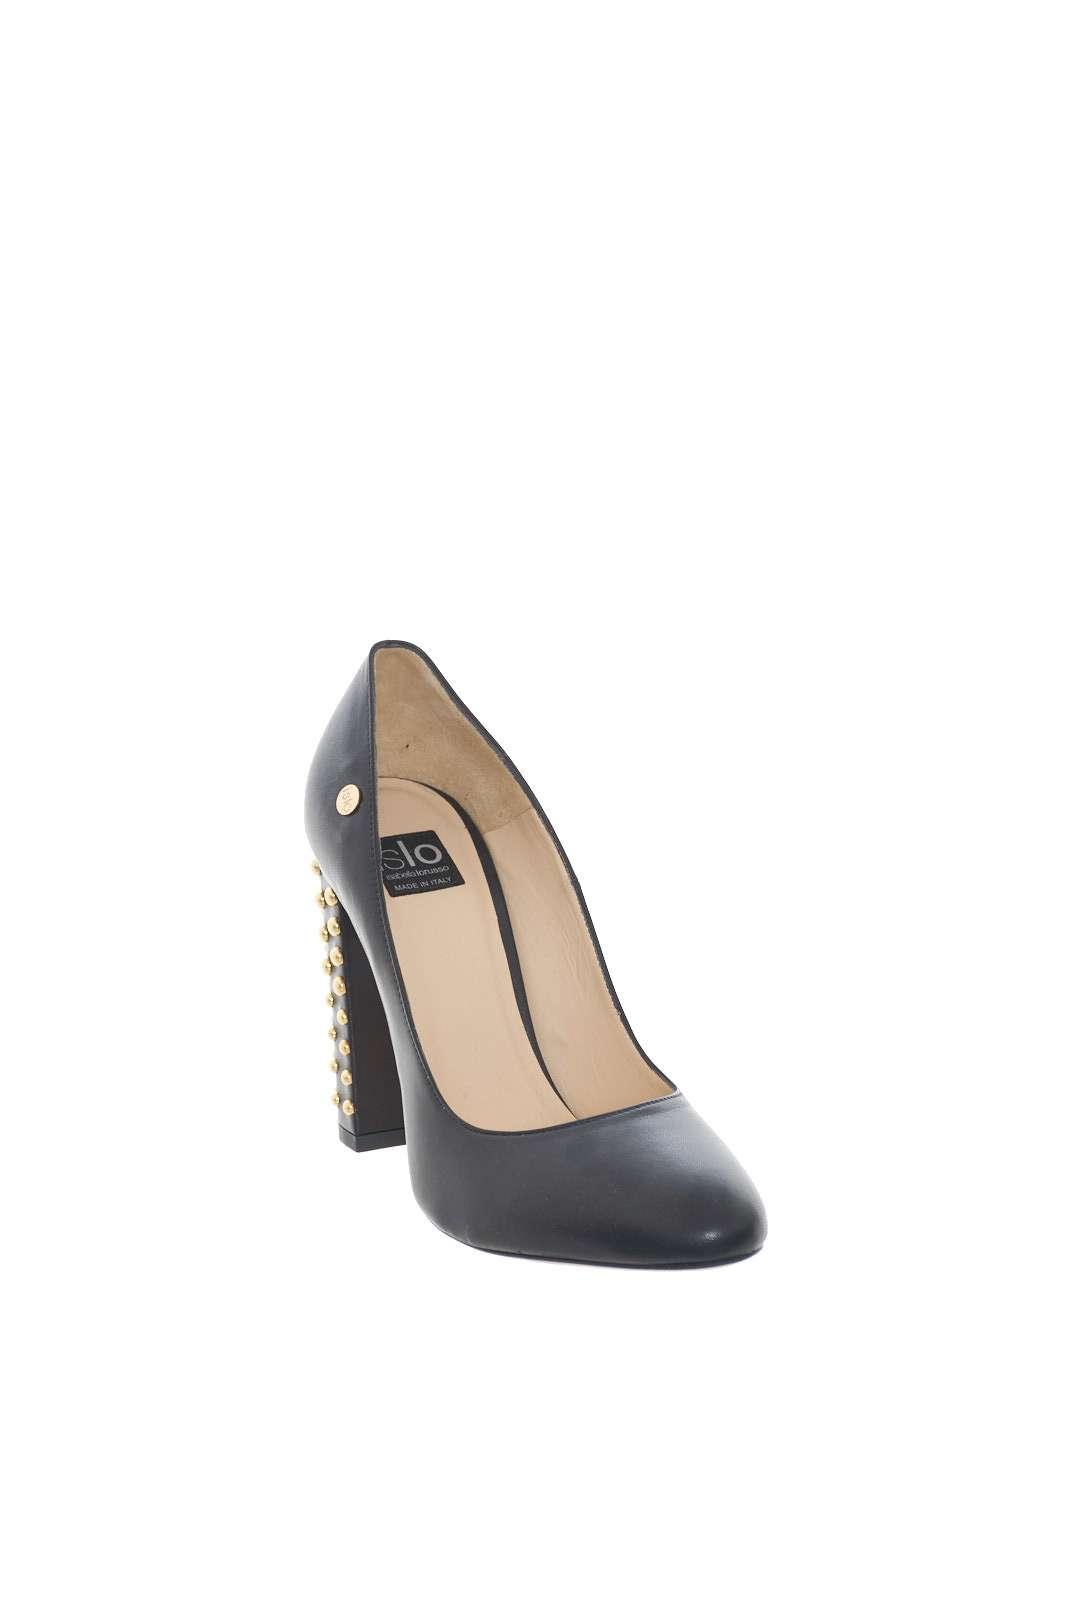 https://www.parmax.com/media/catalog/product/a/i/AI-outlet_parmax-scarpe-donna-isabella-Lorusso-CELIA-B_1.jpg